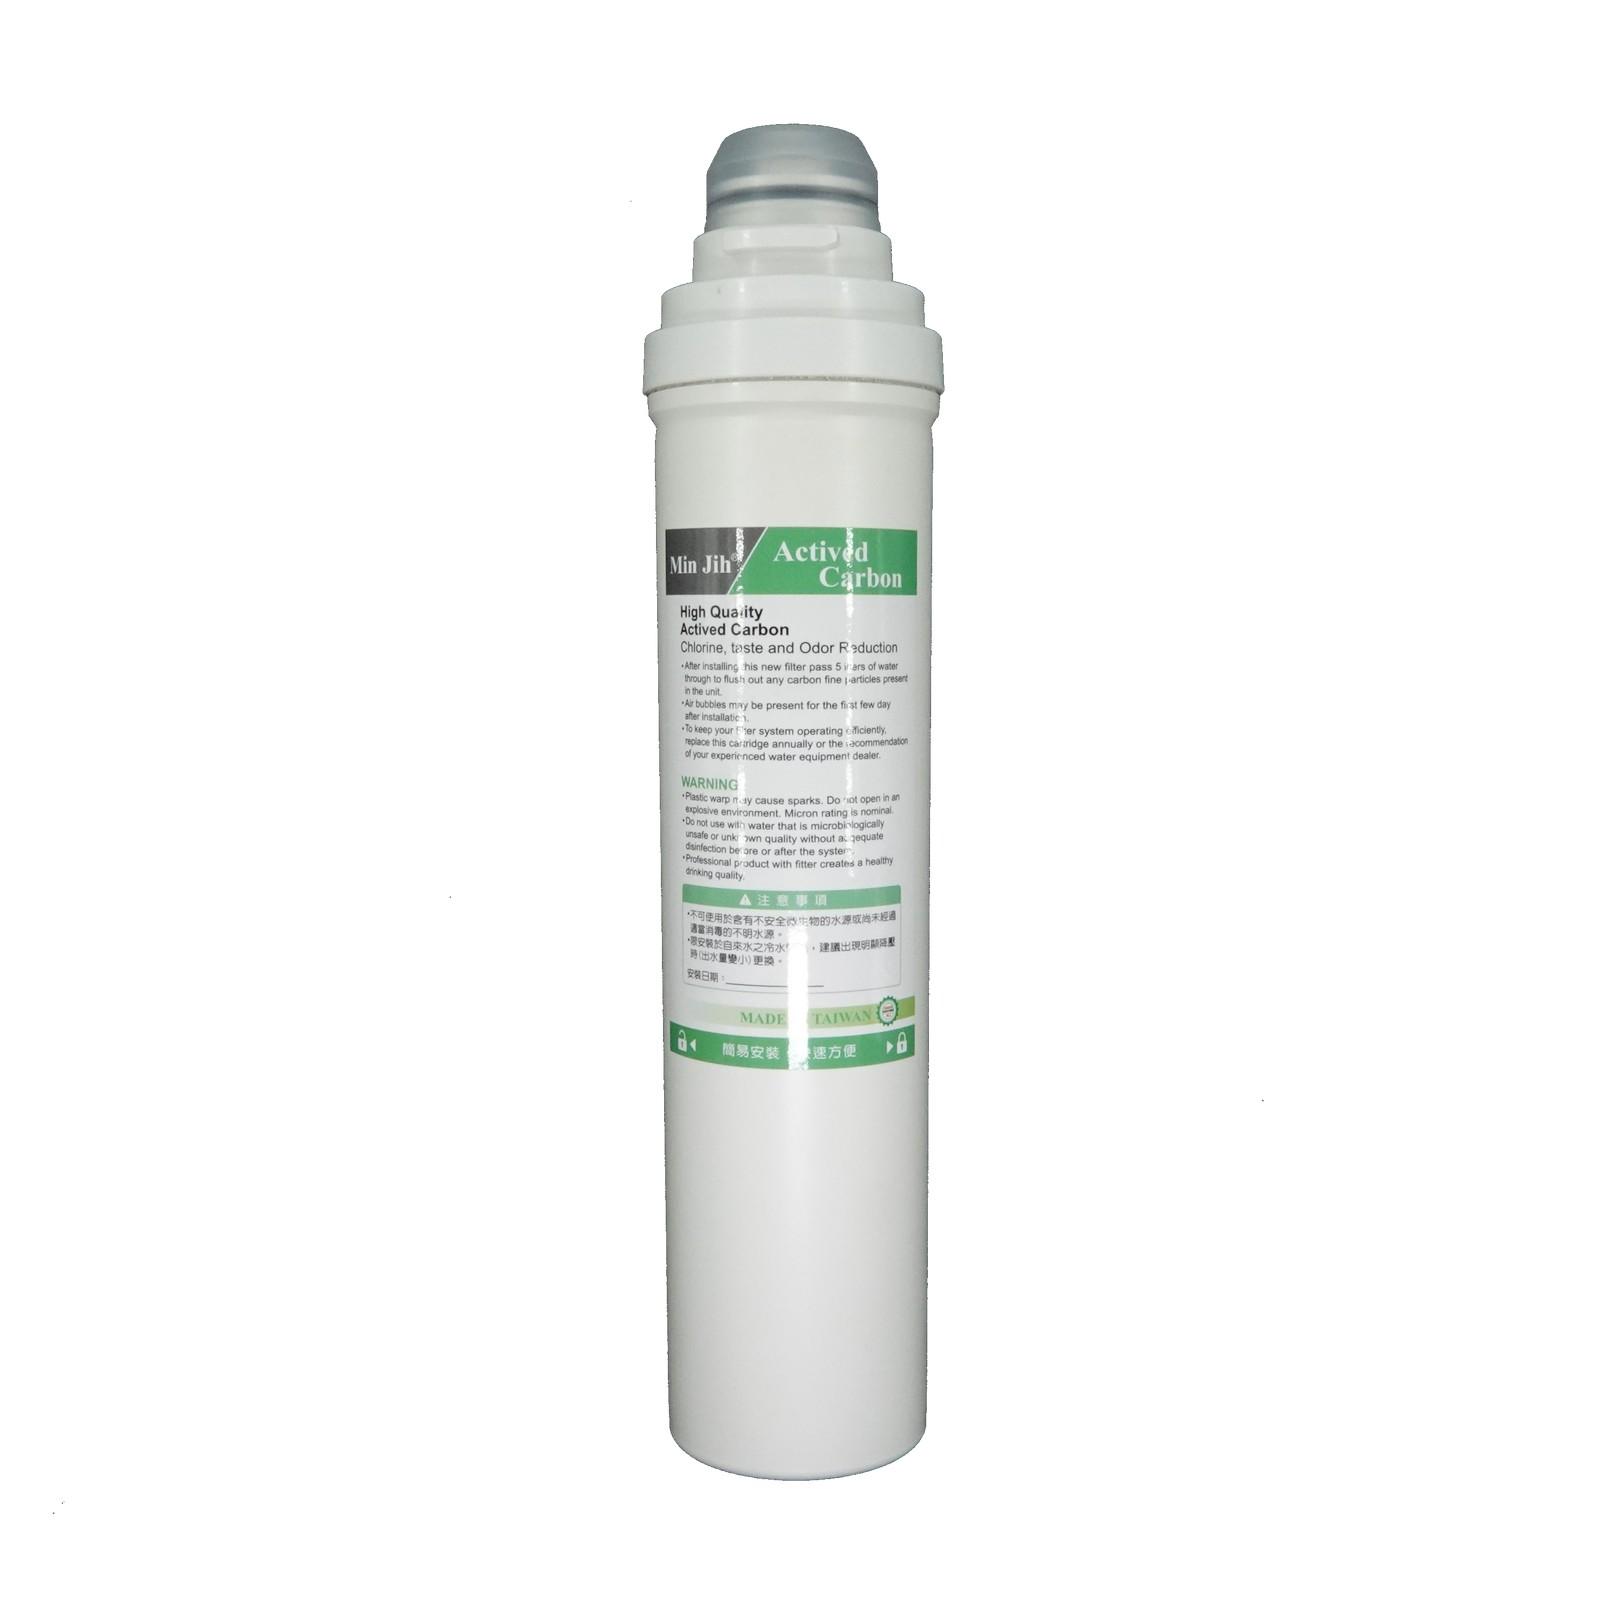 MK626活性碳濾心 – 民記實業股份有限公司 CLEAMTEC M.J